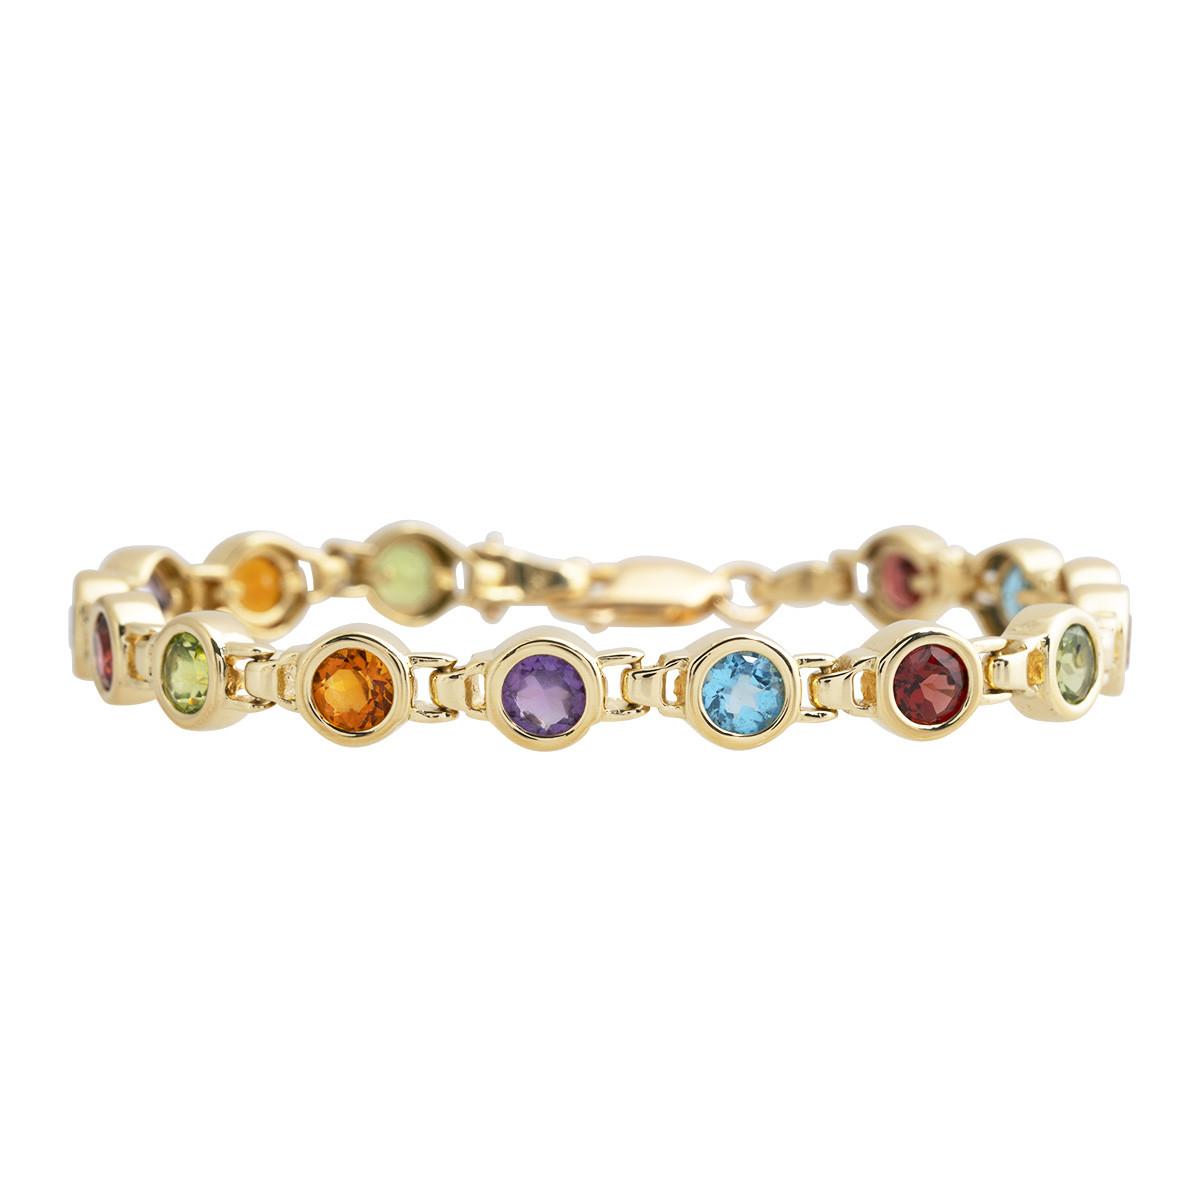 Vintage 3.75 CTW Multi Color Gemstone Tennis Bracelet